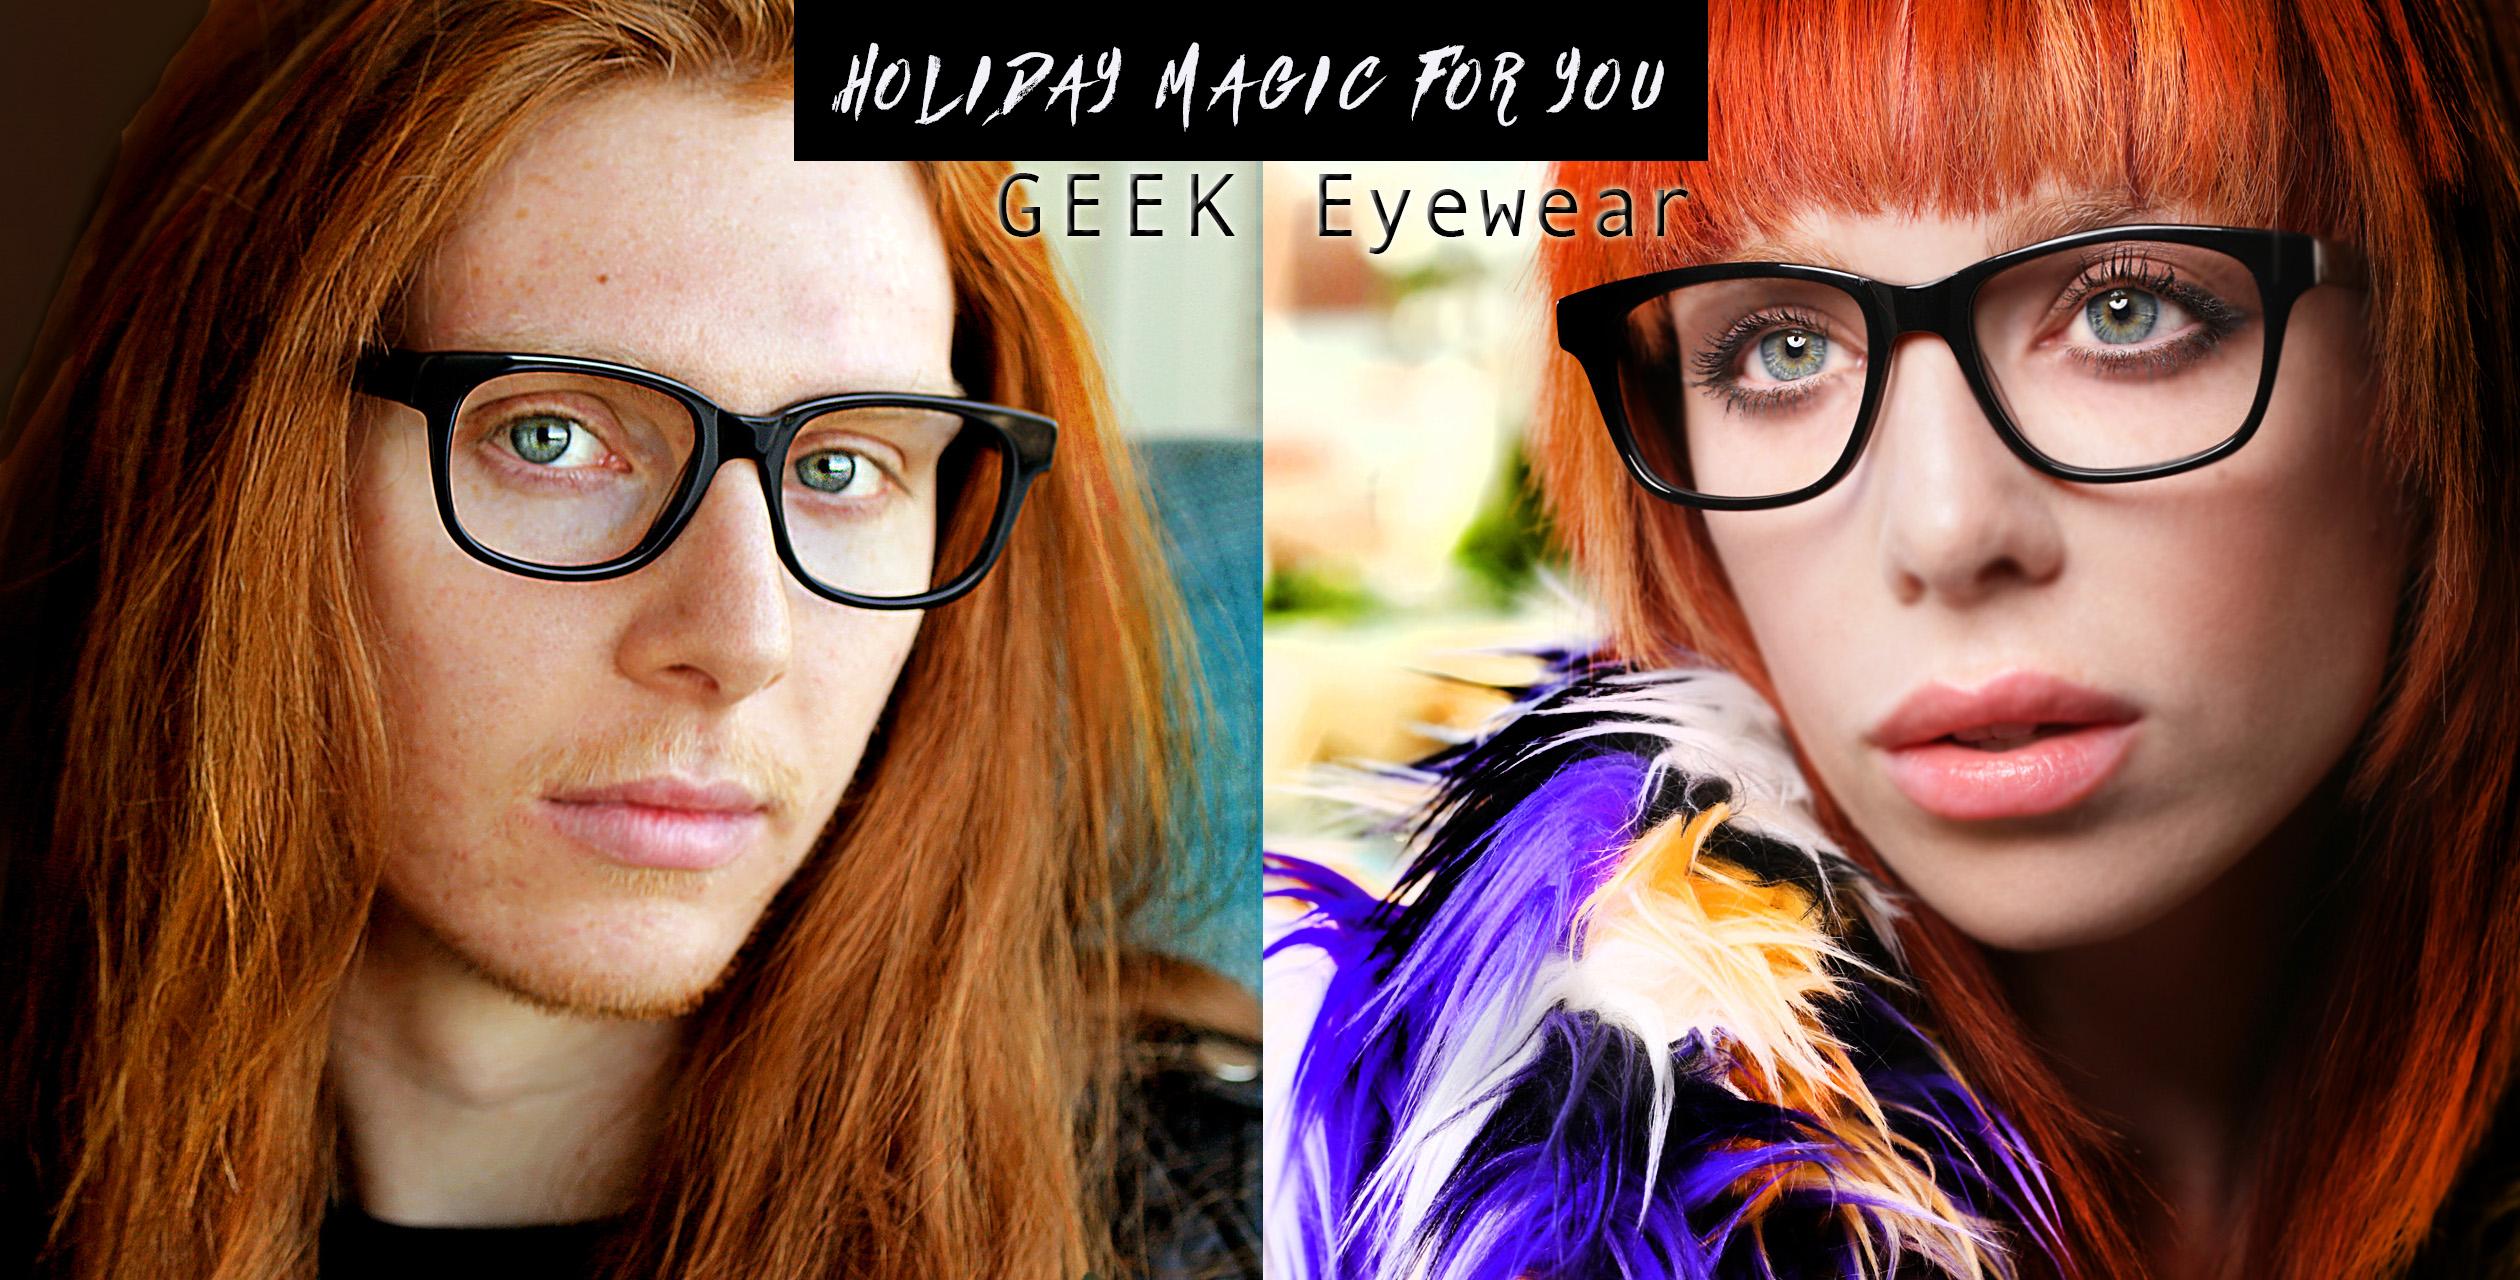 geek-eyewear-geek-syfy-ariana-brother.jpg